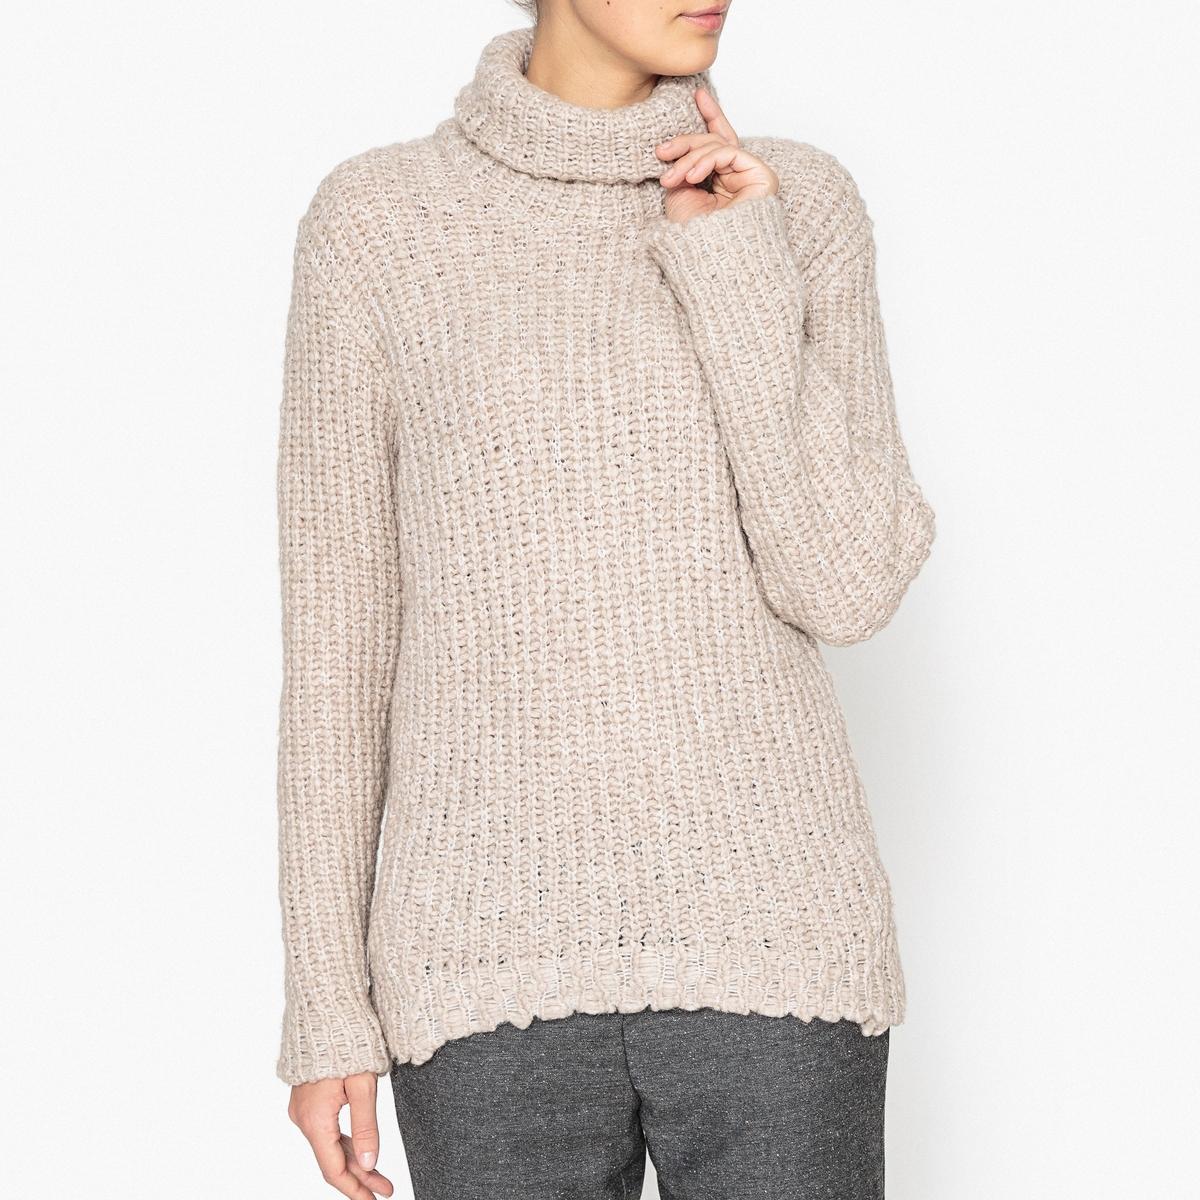 Пуловер с воротником с отворотом BERGMAN пуловер свободный с воротником с отворотом plunkett